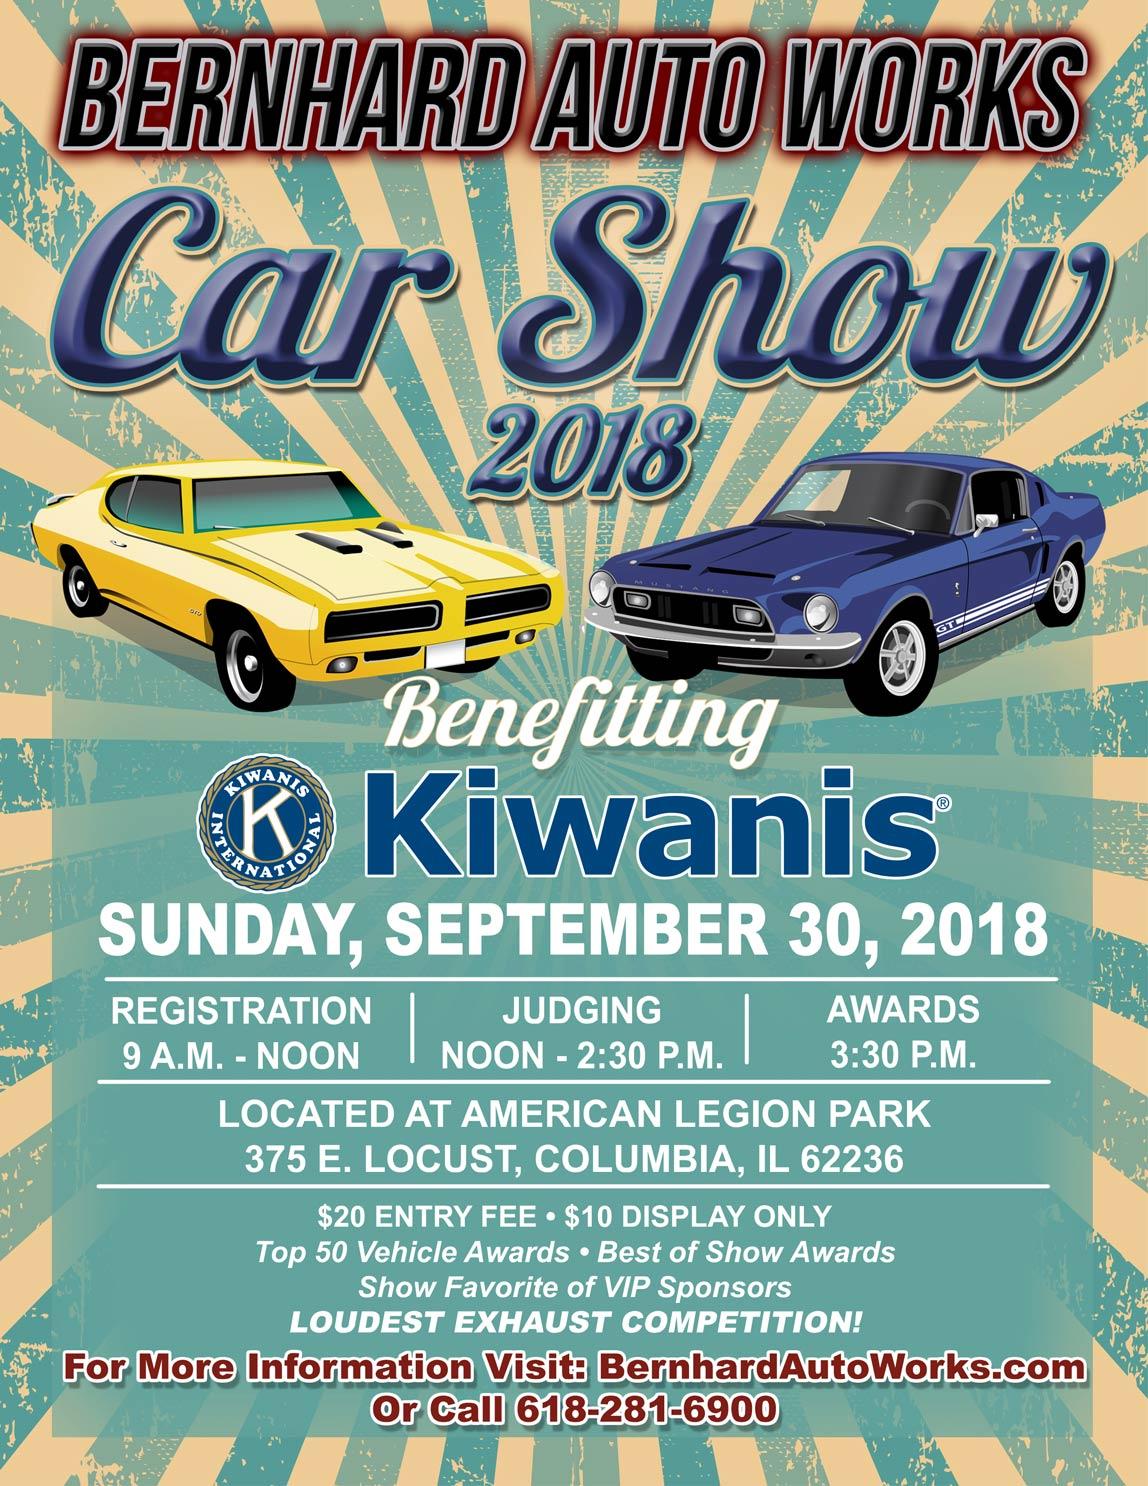 Bernhard AutoWorks About Us Car Show - Car show awards